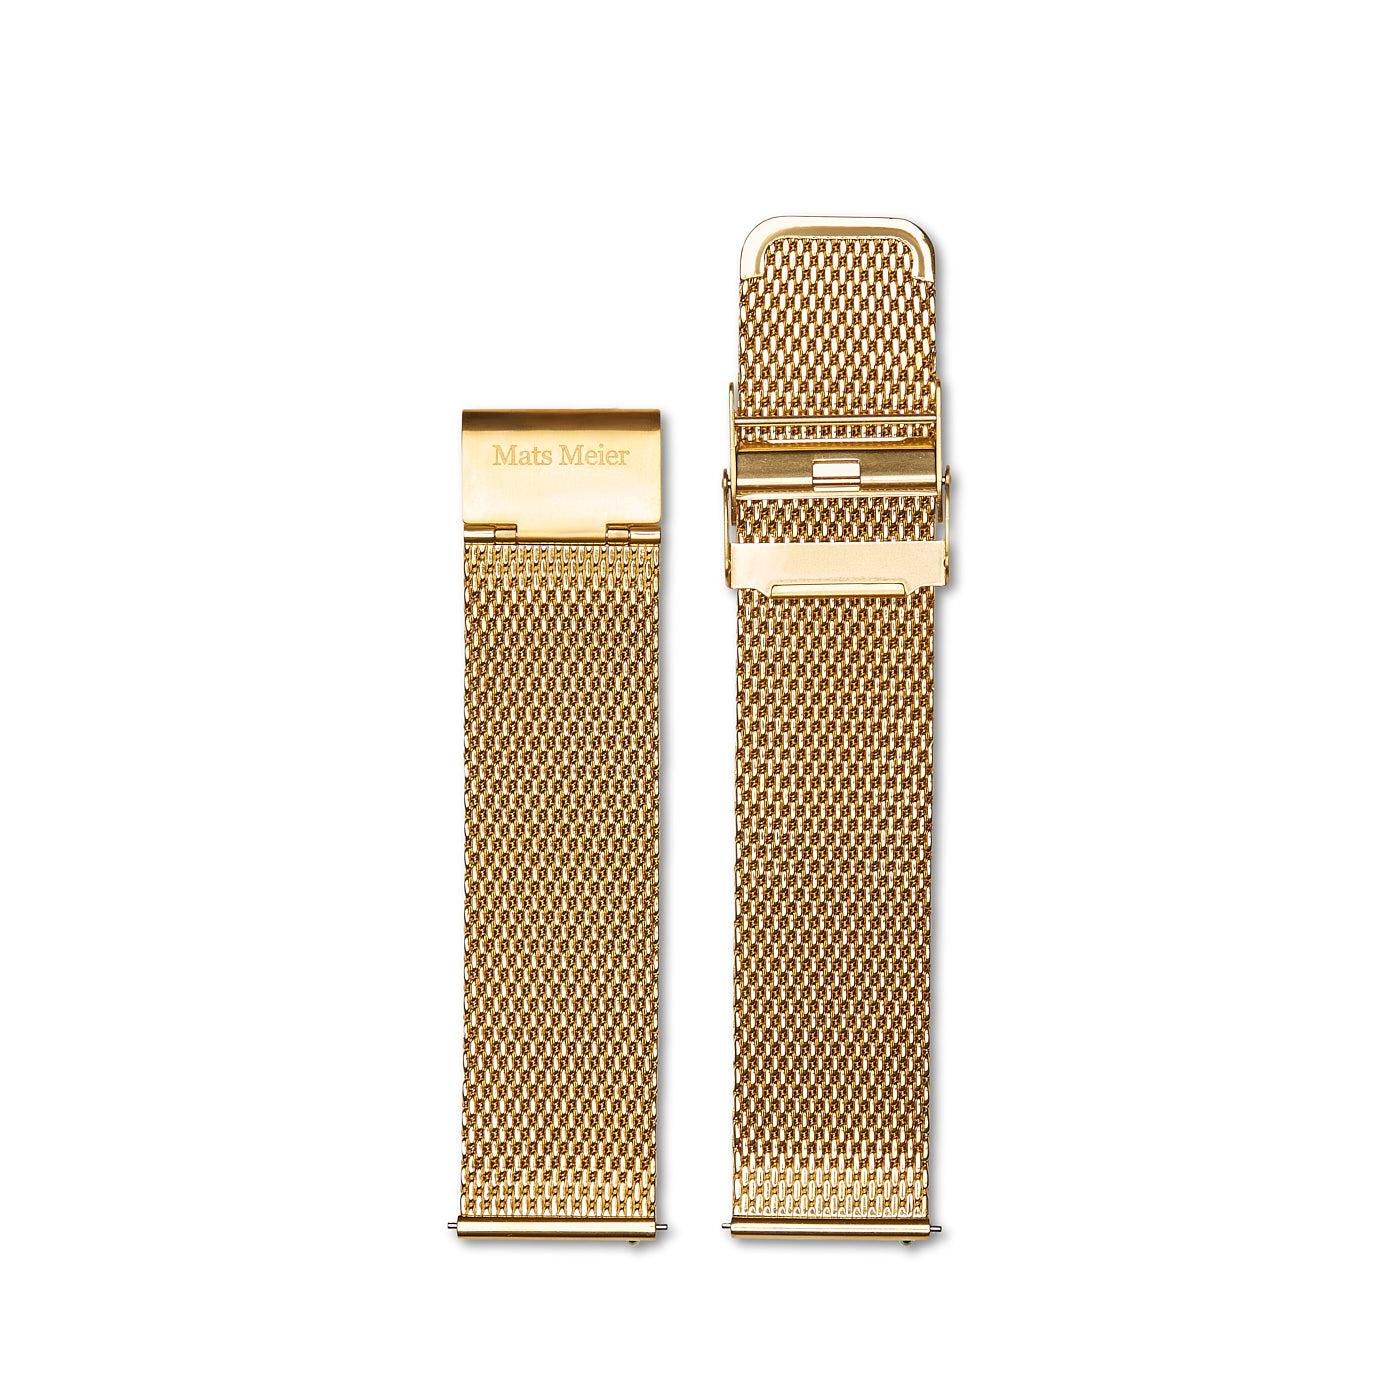 Mats Meier strap 22 mm gold colored